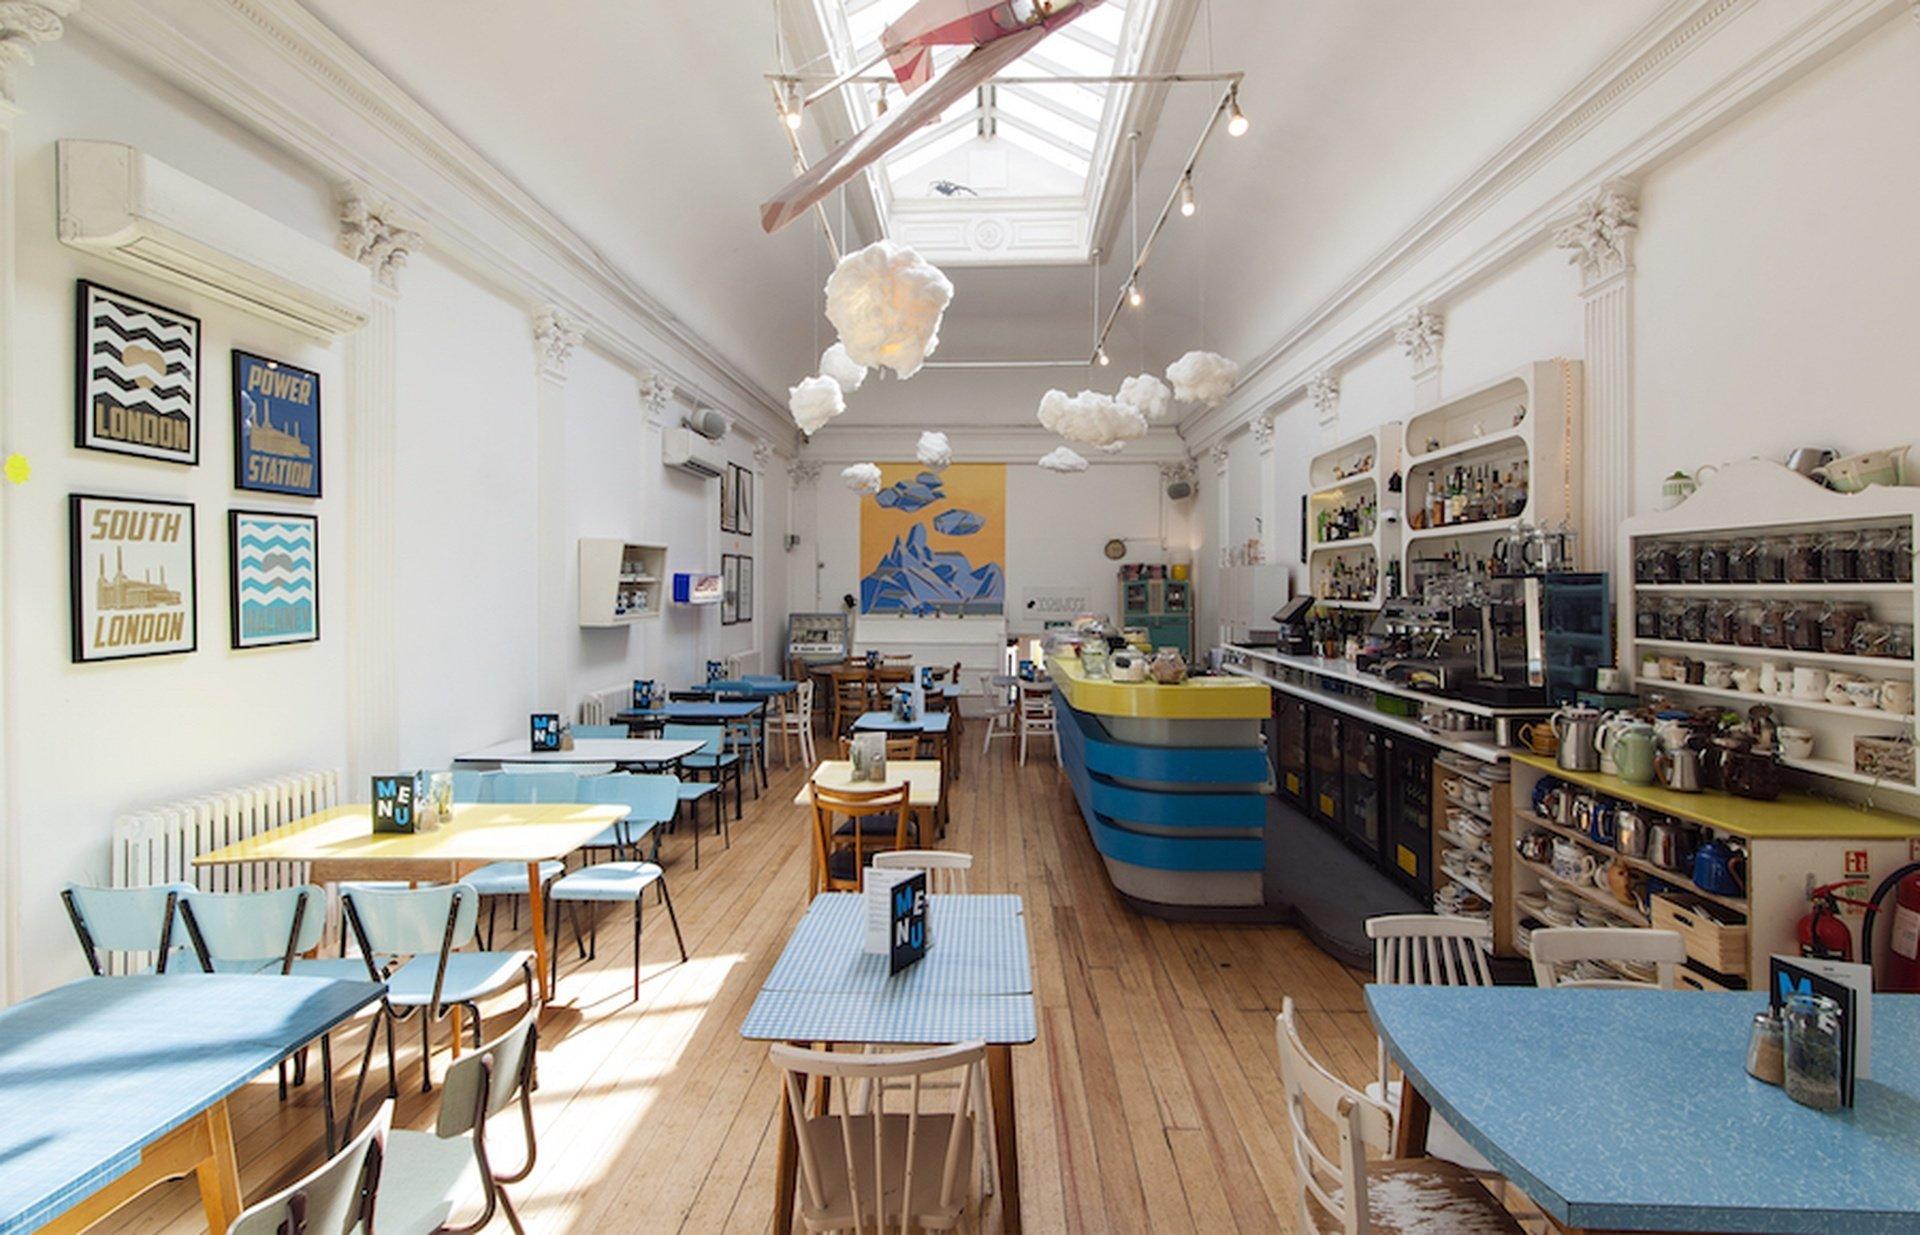 London Train station meeting rooms Cafe Drink Shop & Do - Cafe image 3